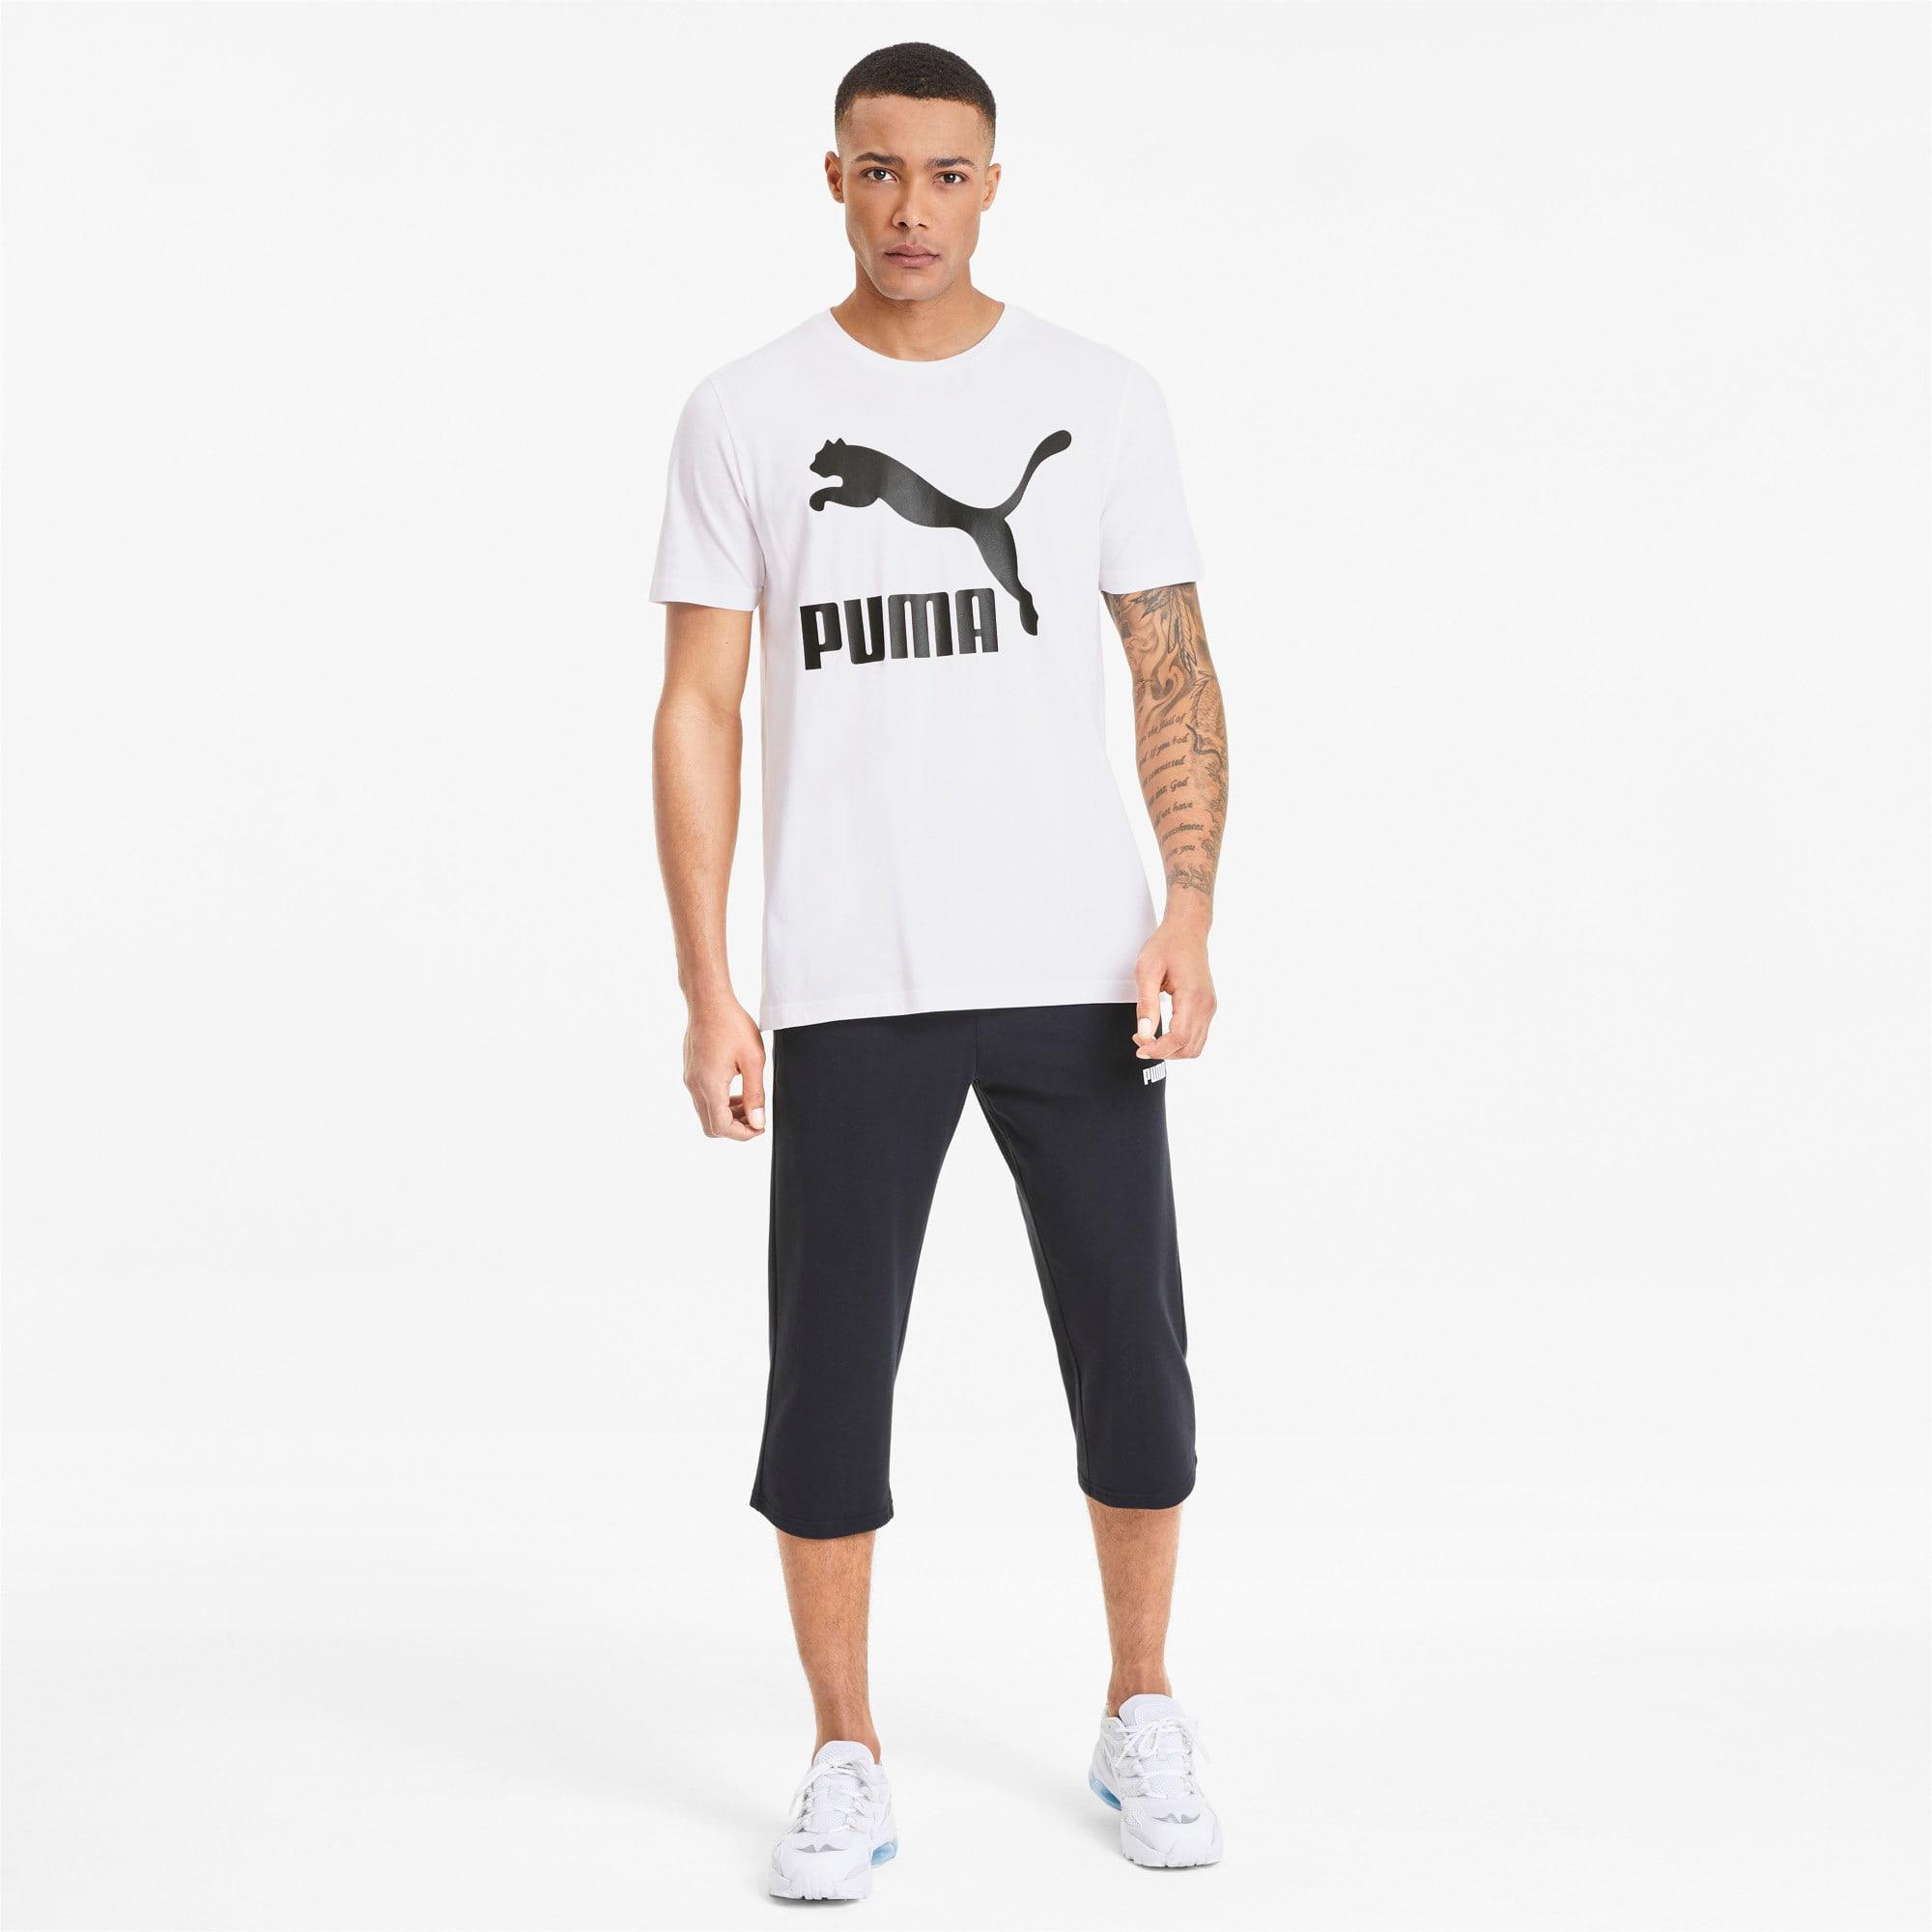 Thumbnail 3 van Classics T-shirt met logo voor mannen, Puma White, medium